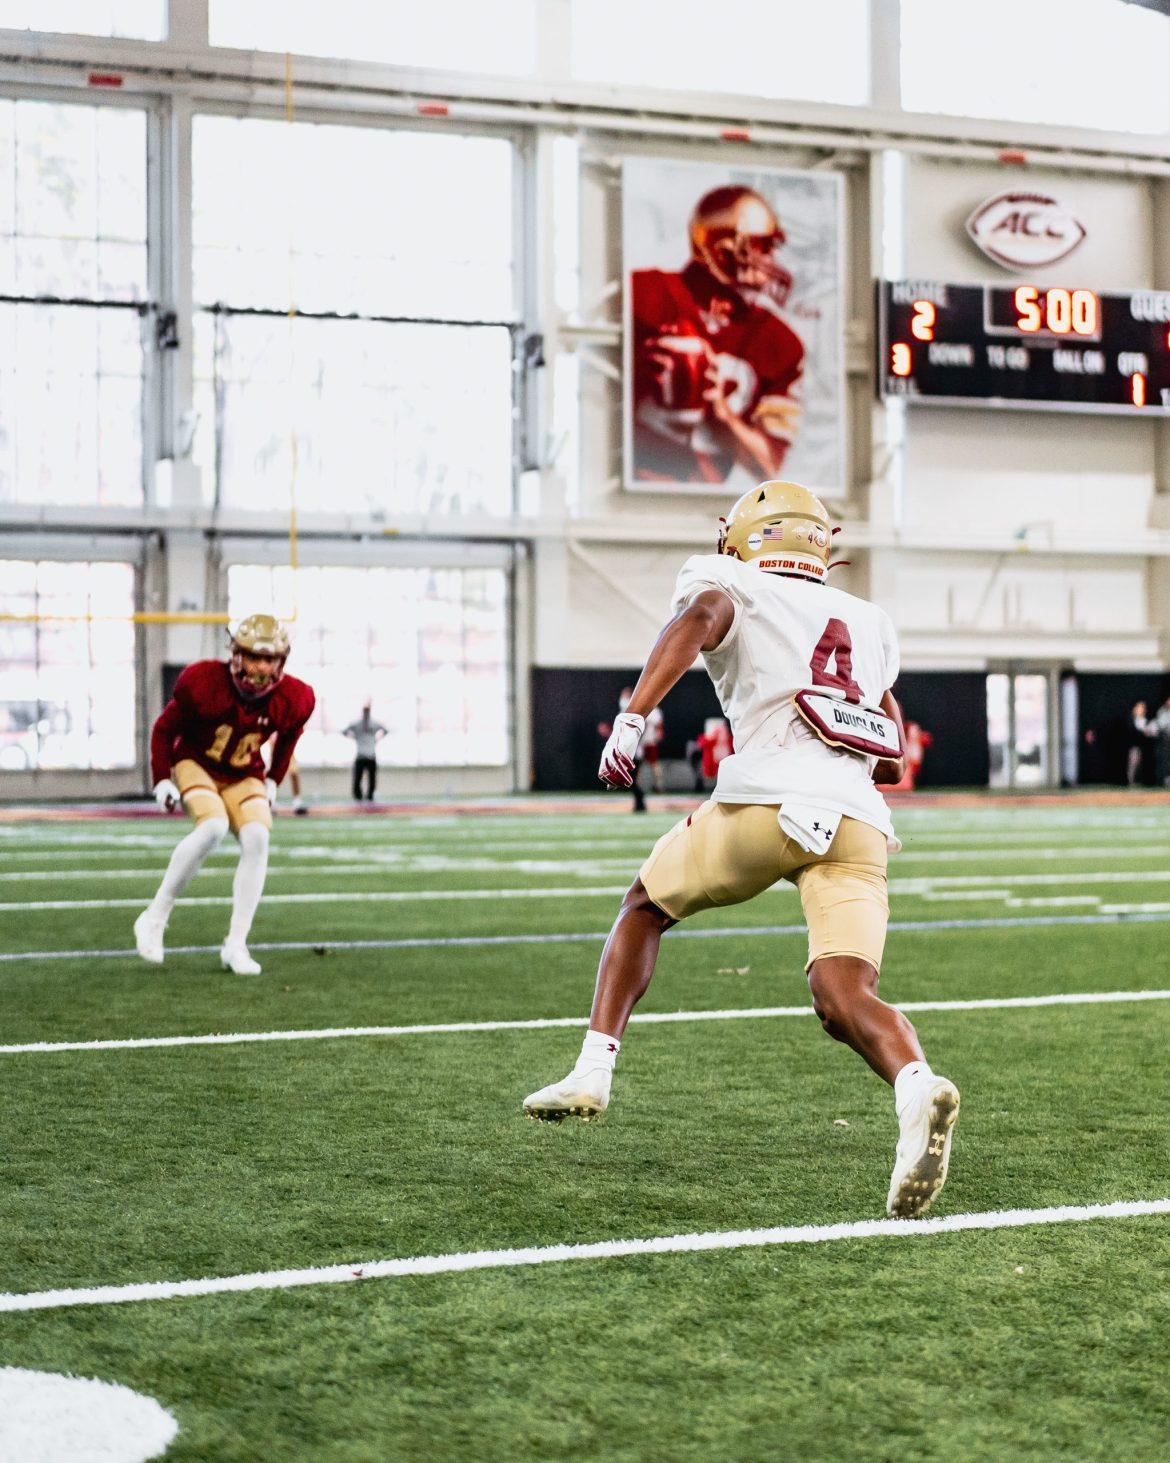 Boston College Spring Football Blog #4: Full Pads Make Debut